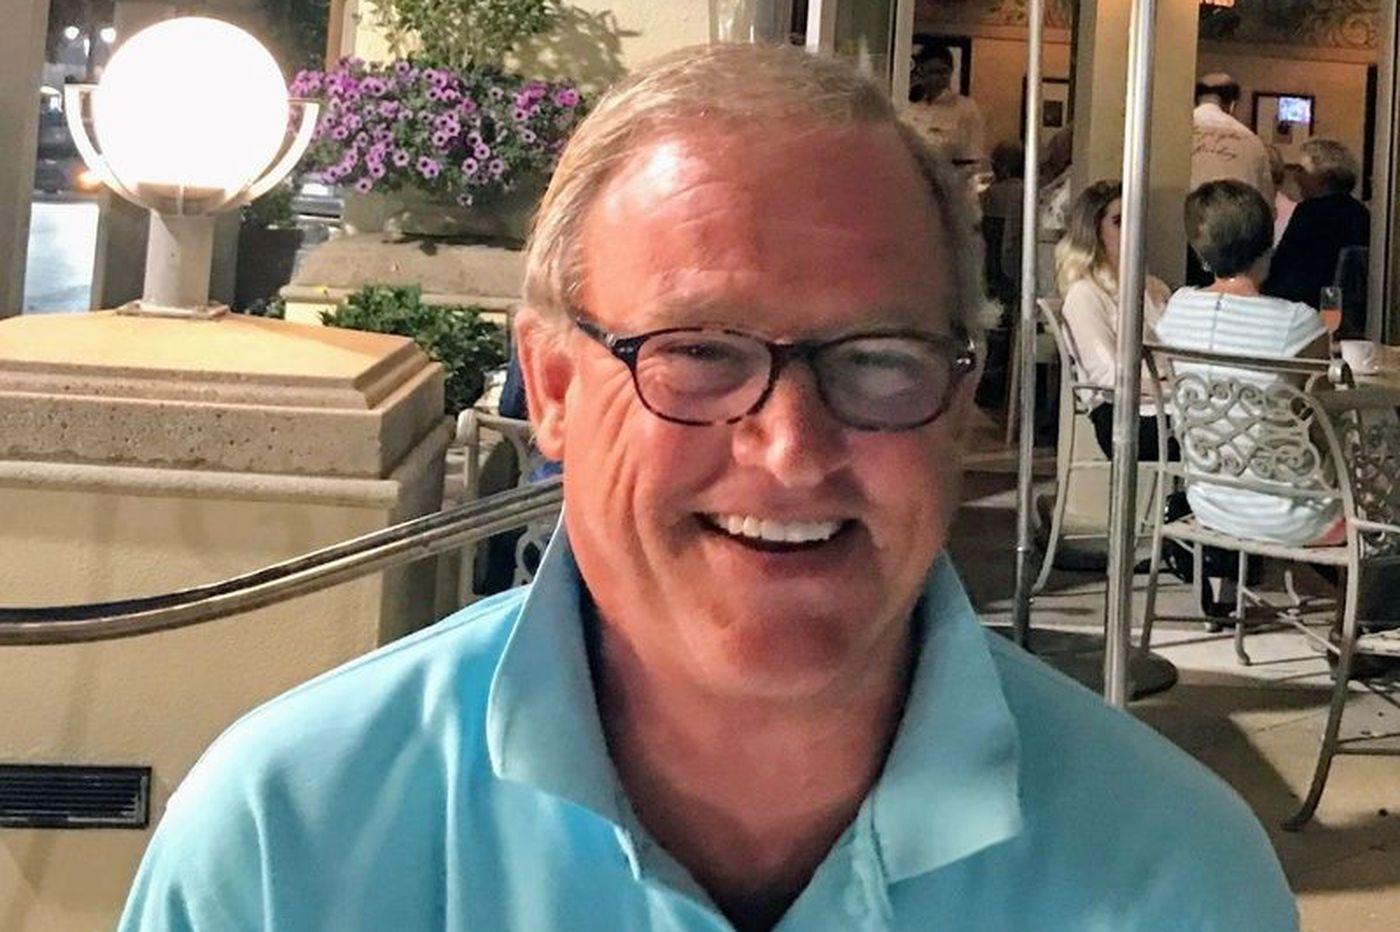 Jeffrey J. Bond, 69, former Catholic priest and teacher who became a social service administrator and family man